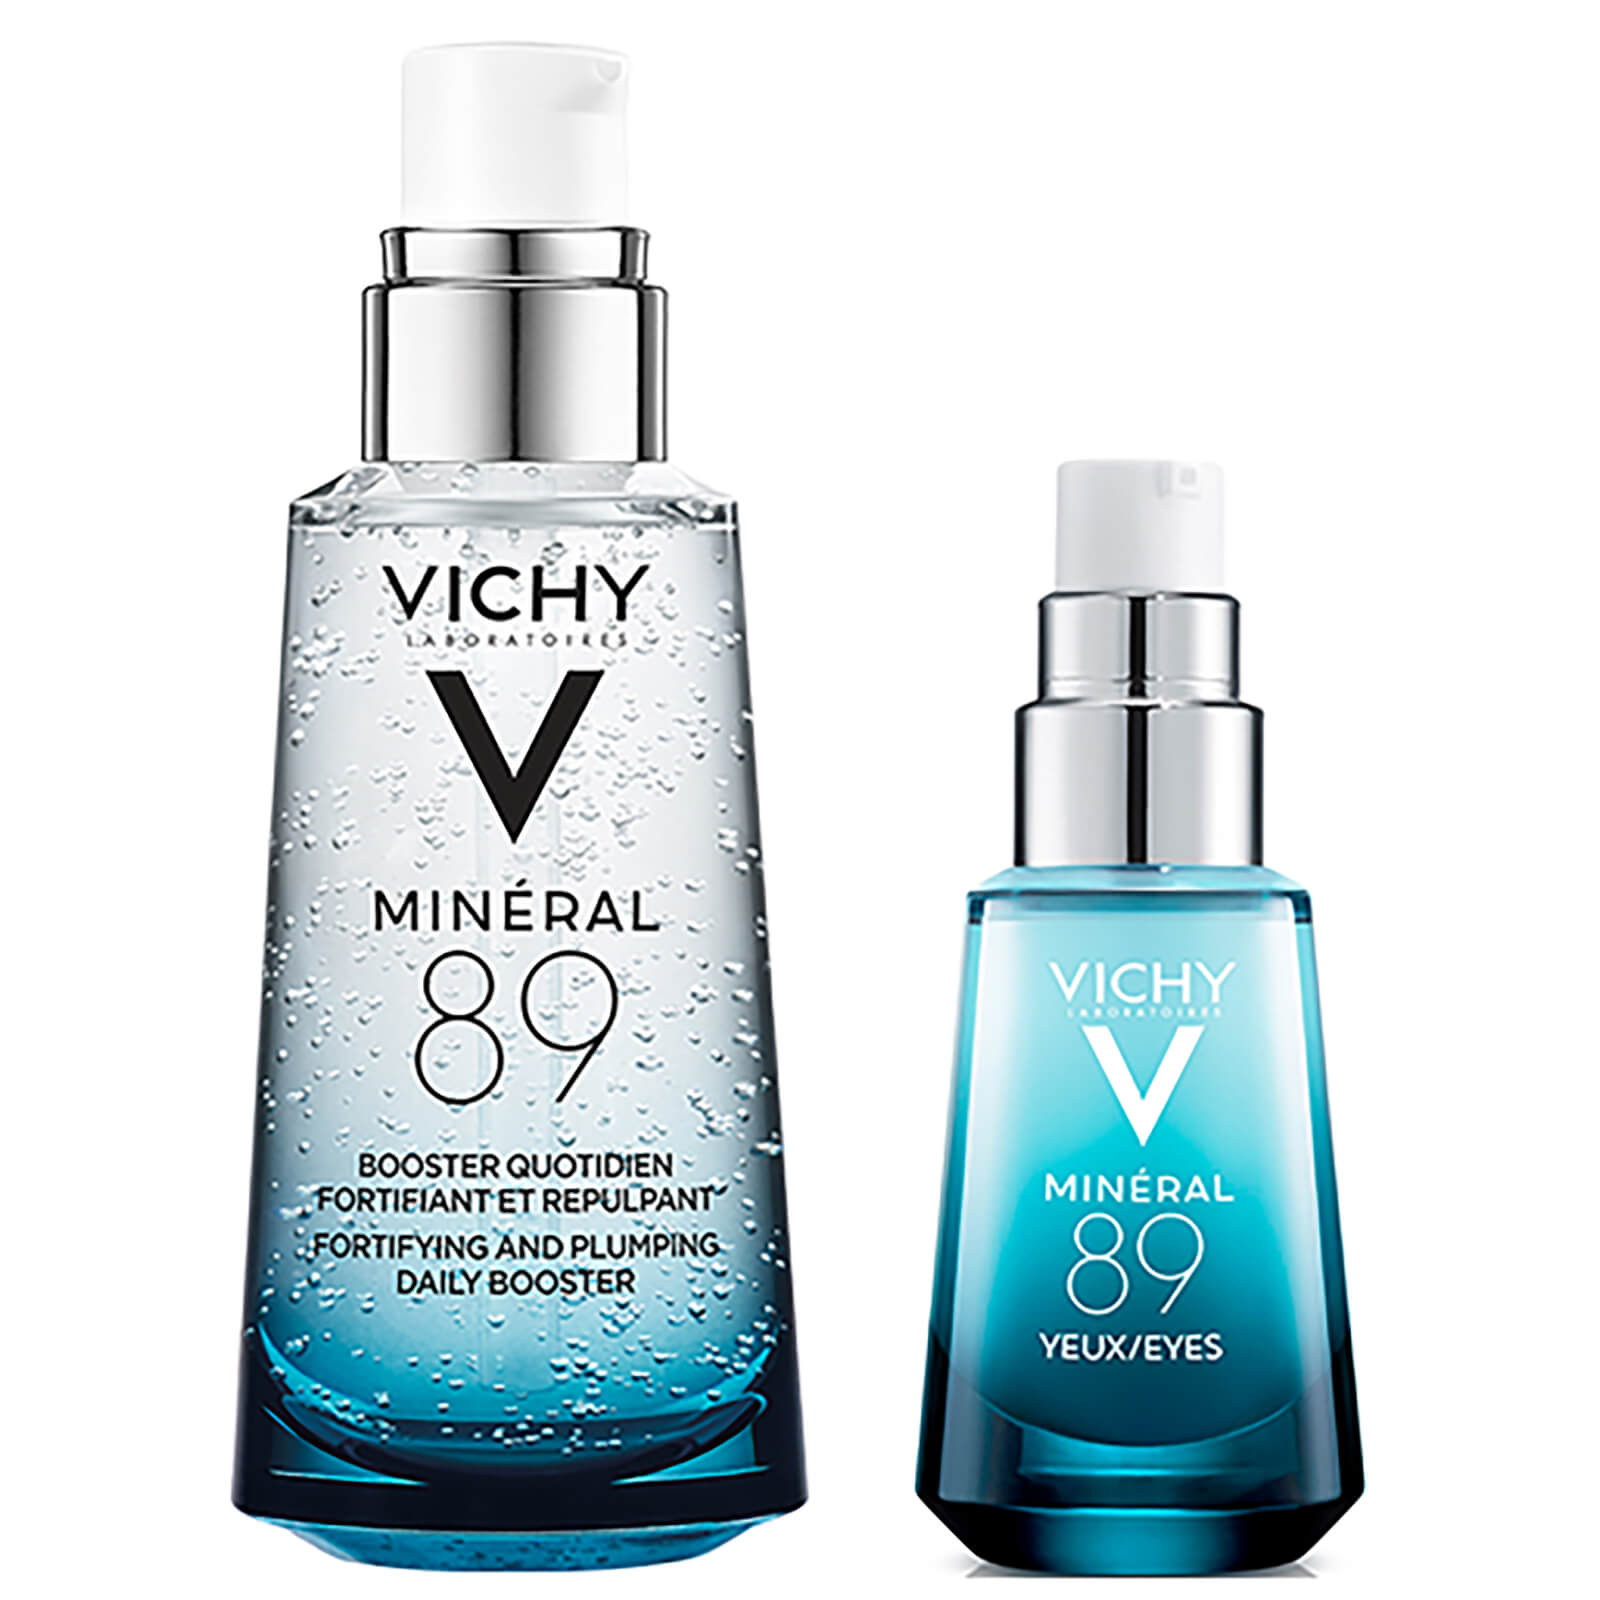 VICHY Mineral 89 Hyaluronic Acid Bundle